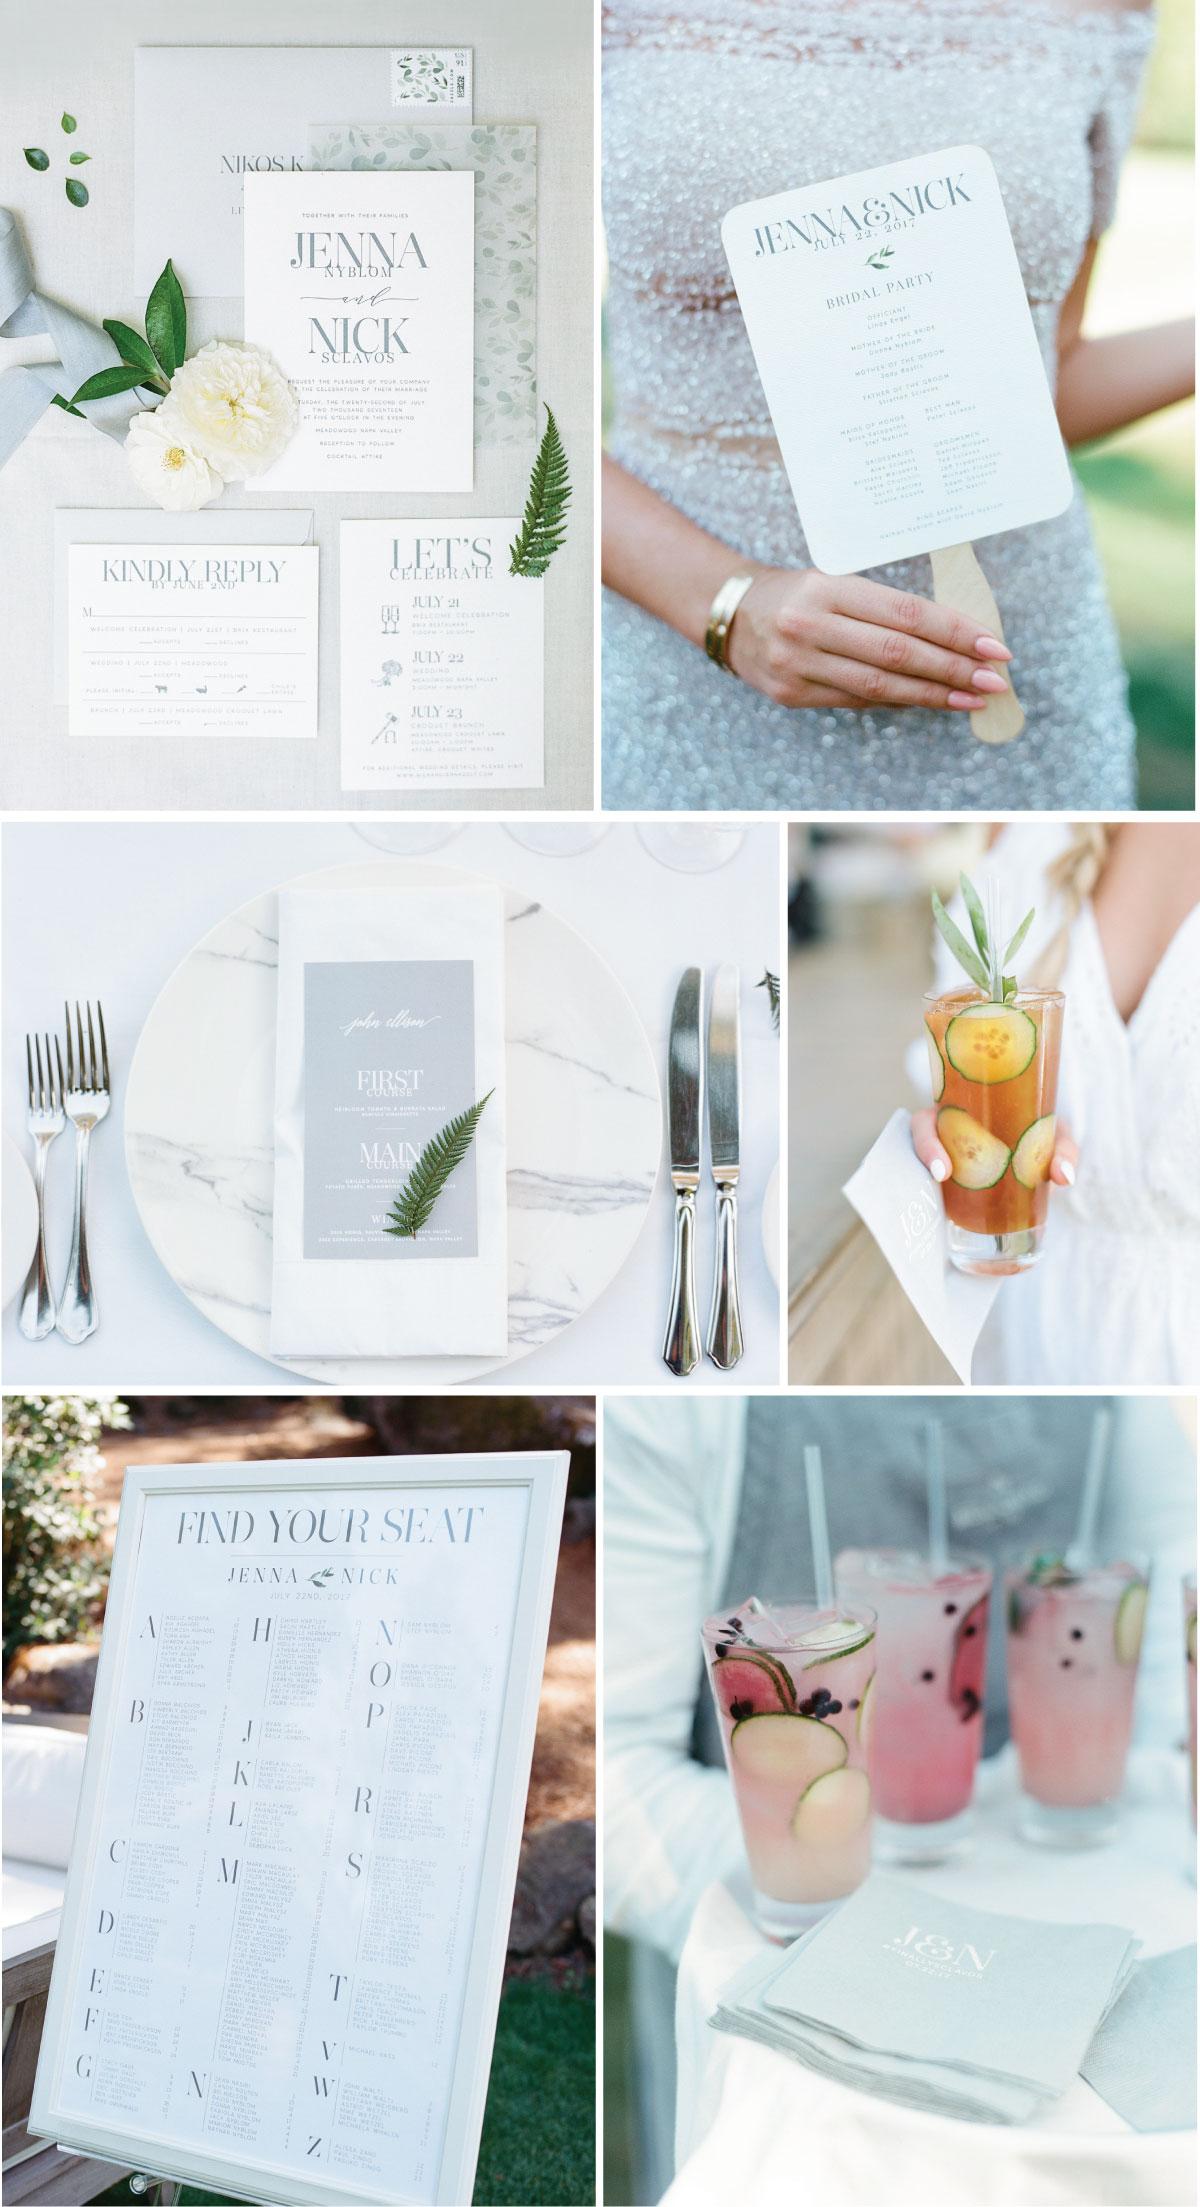 Jenna Light Custom Wedding Invitations